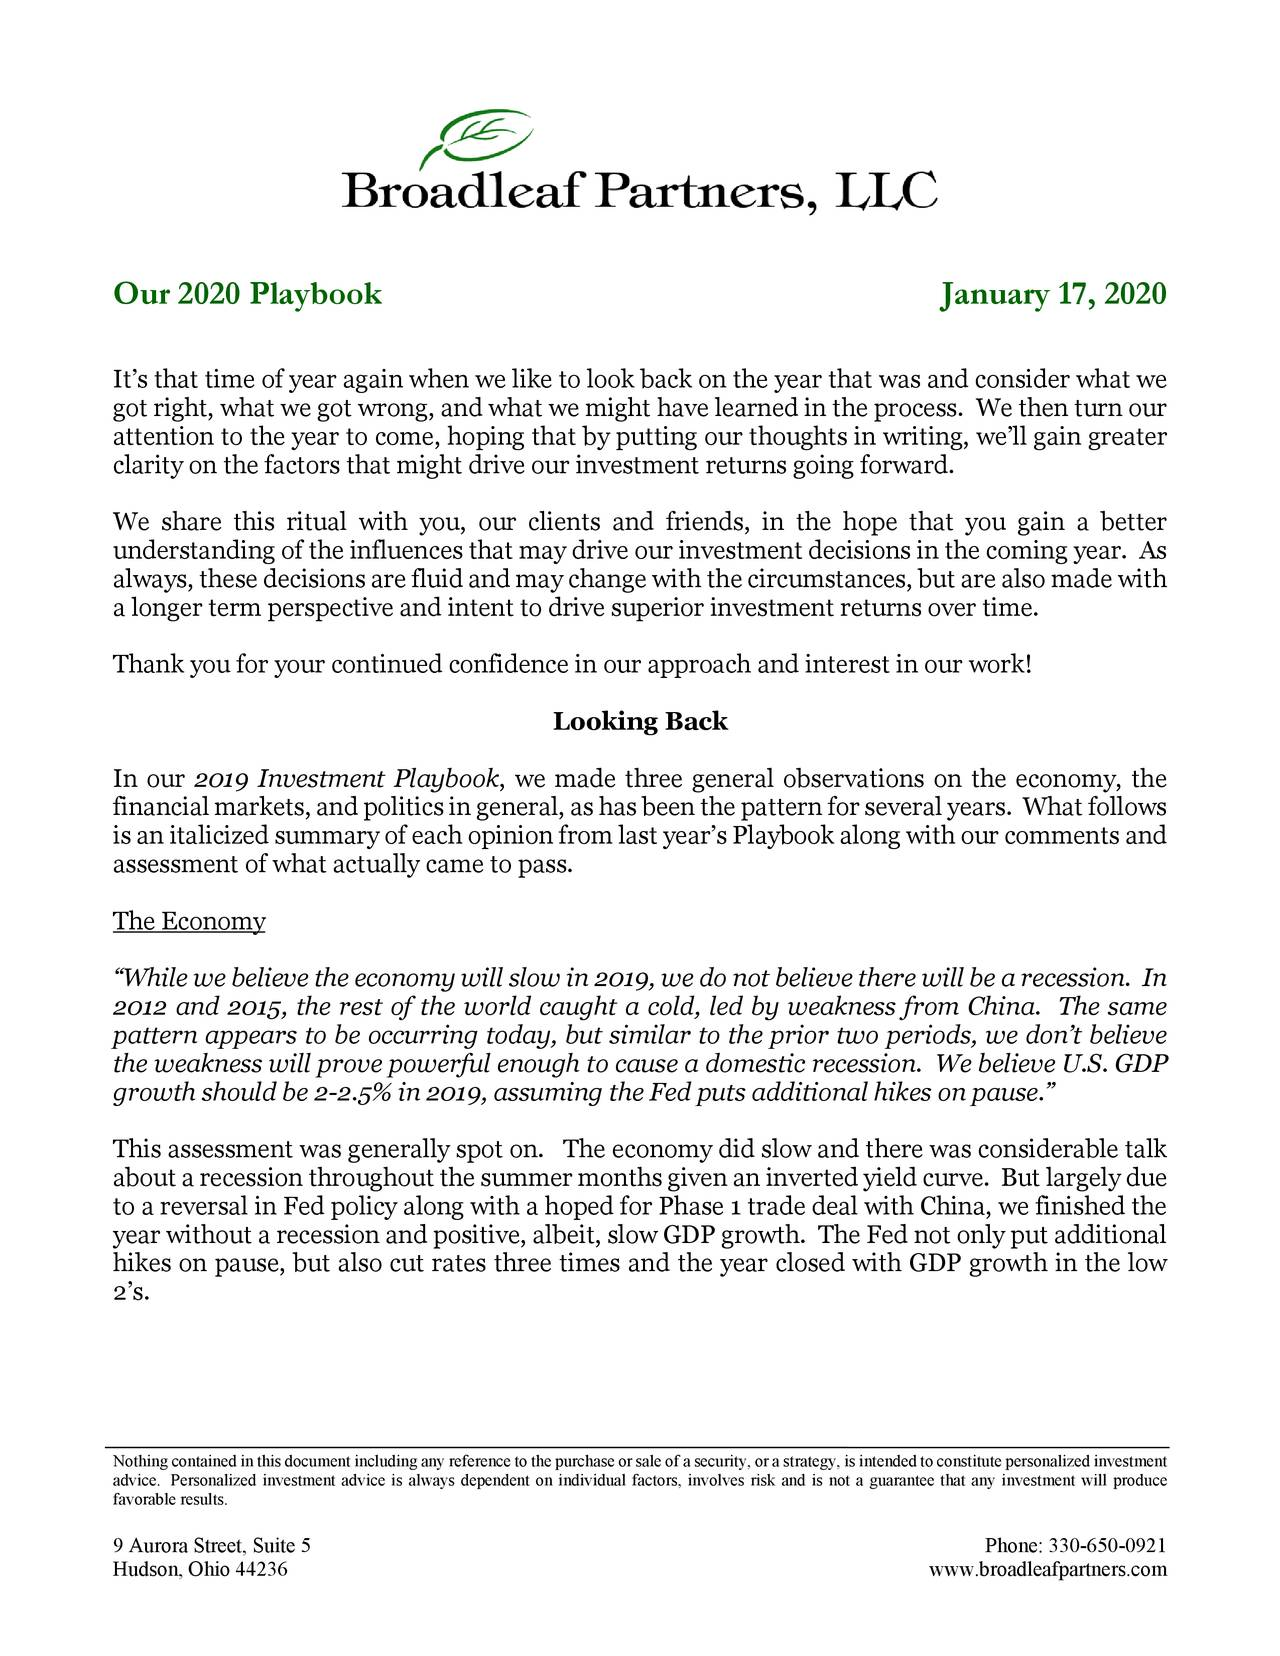 Broadleaf Partners 2020 Investment Playbook | Seeking Alpha